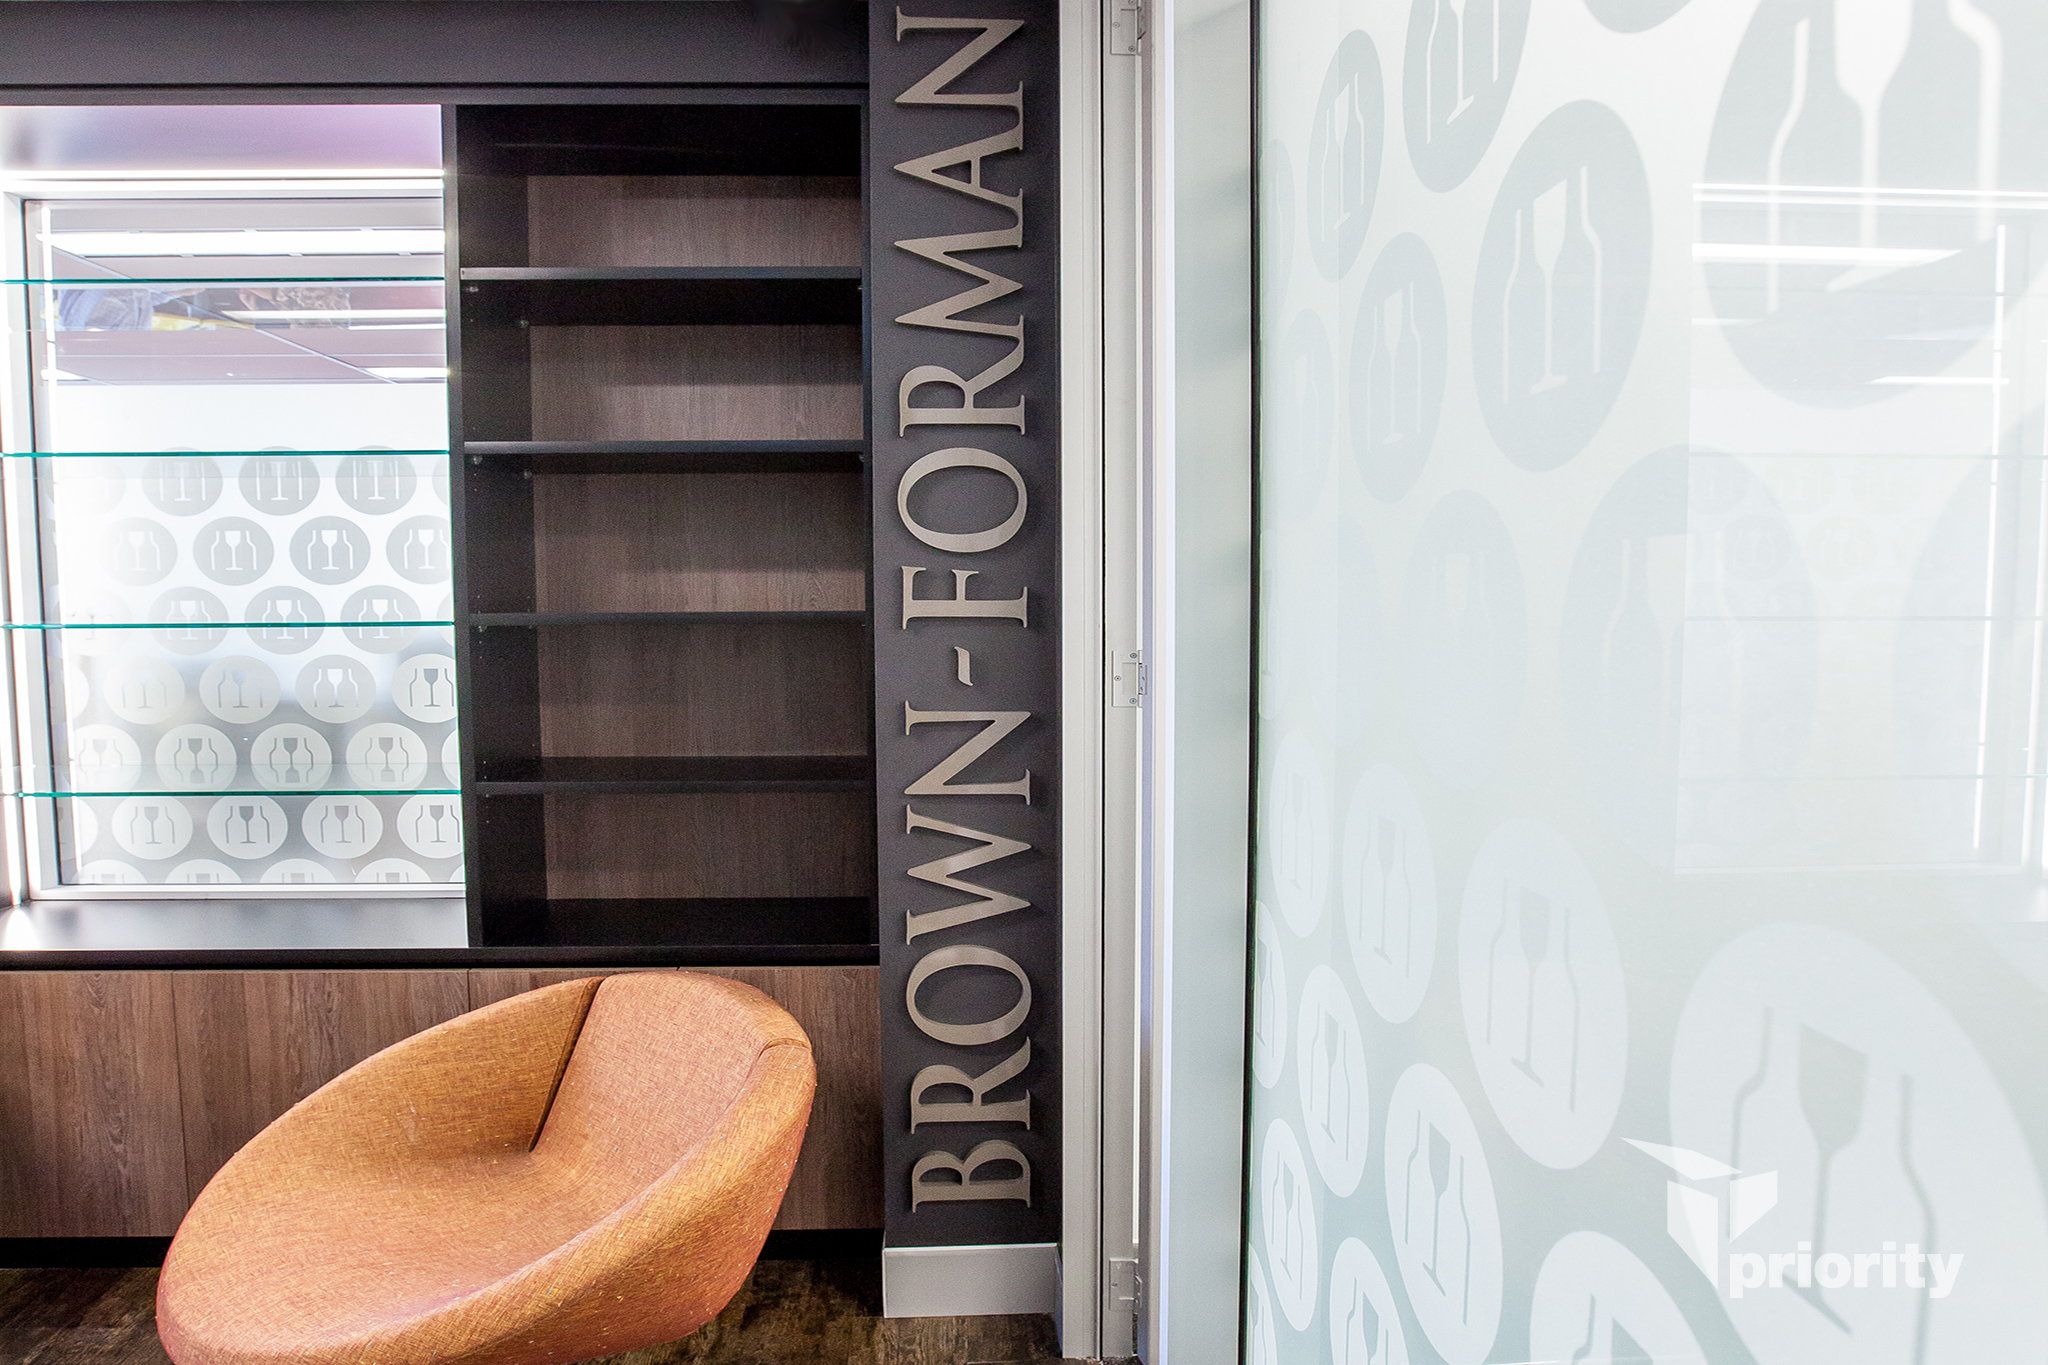 Brown-Forman Inc